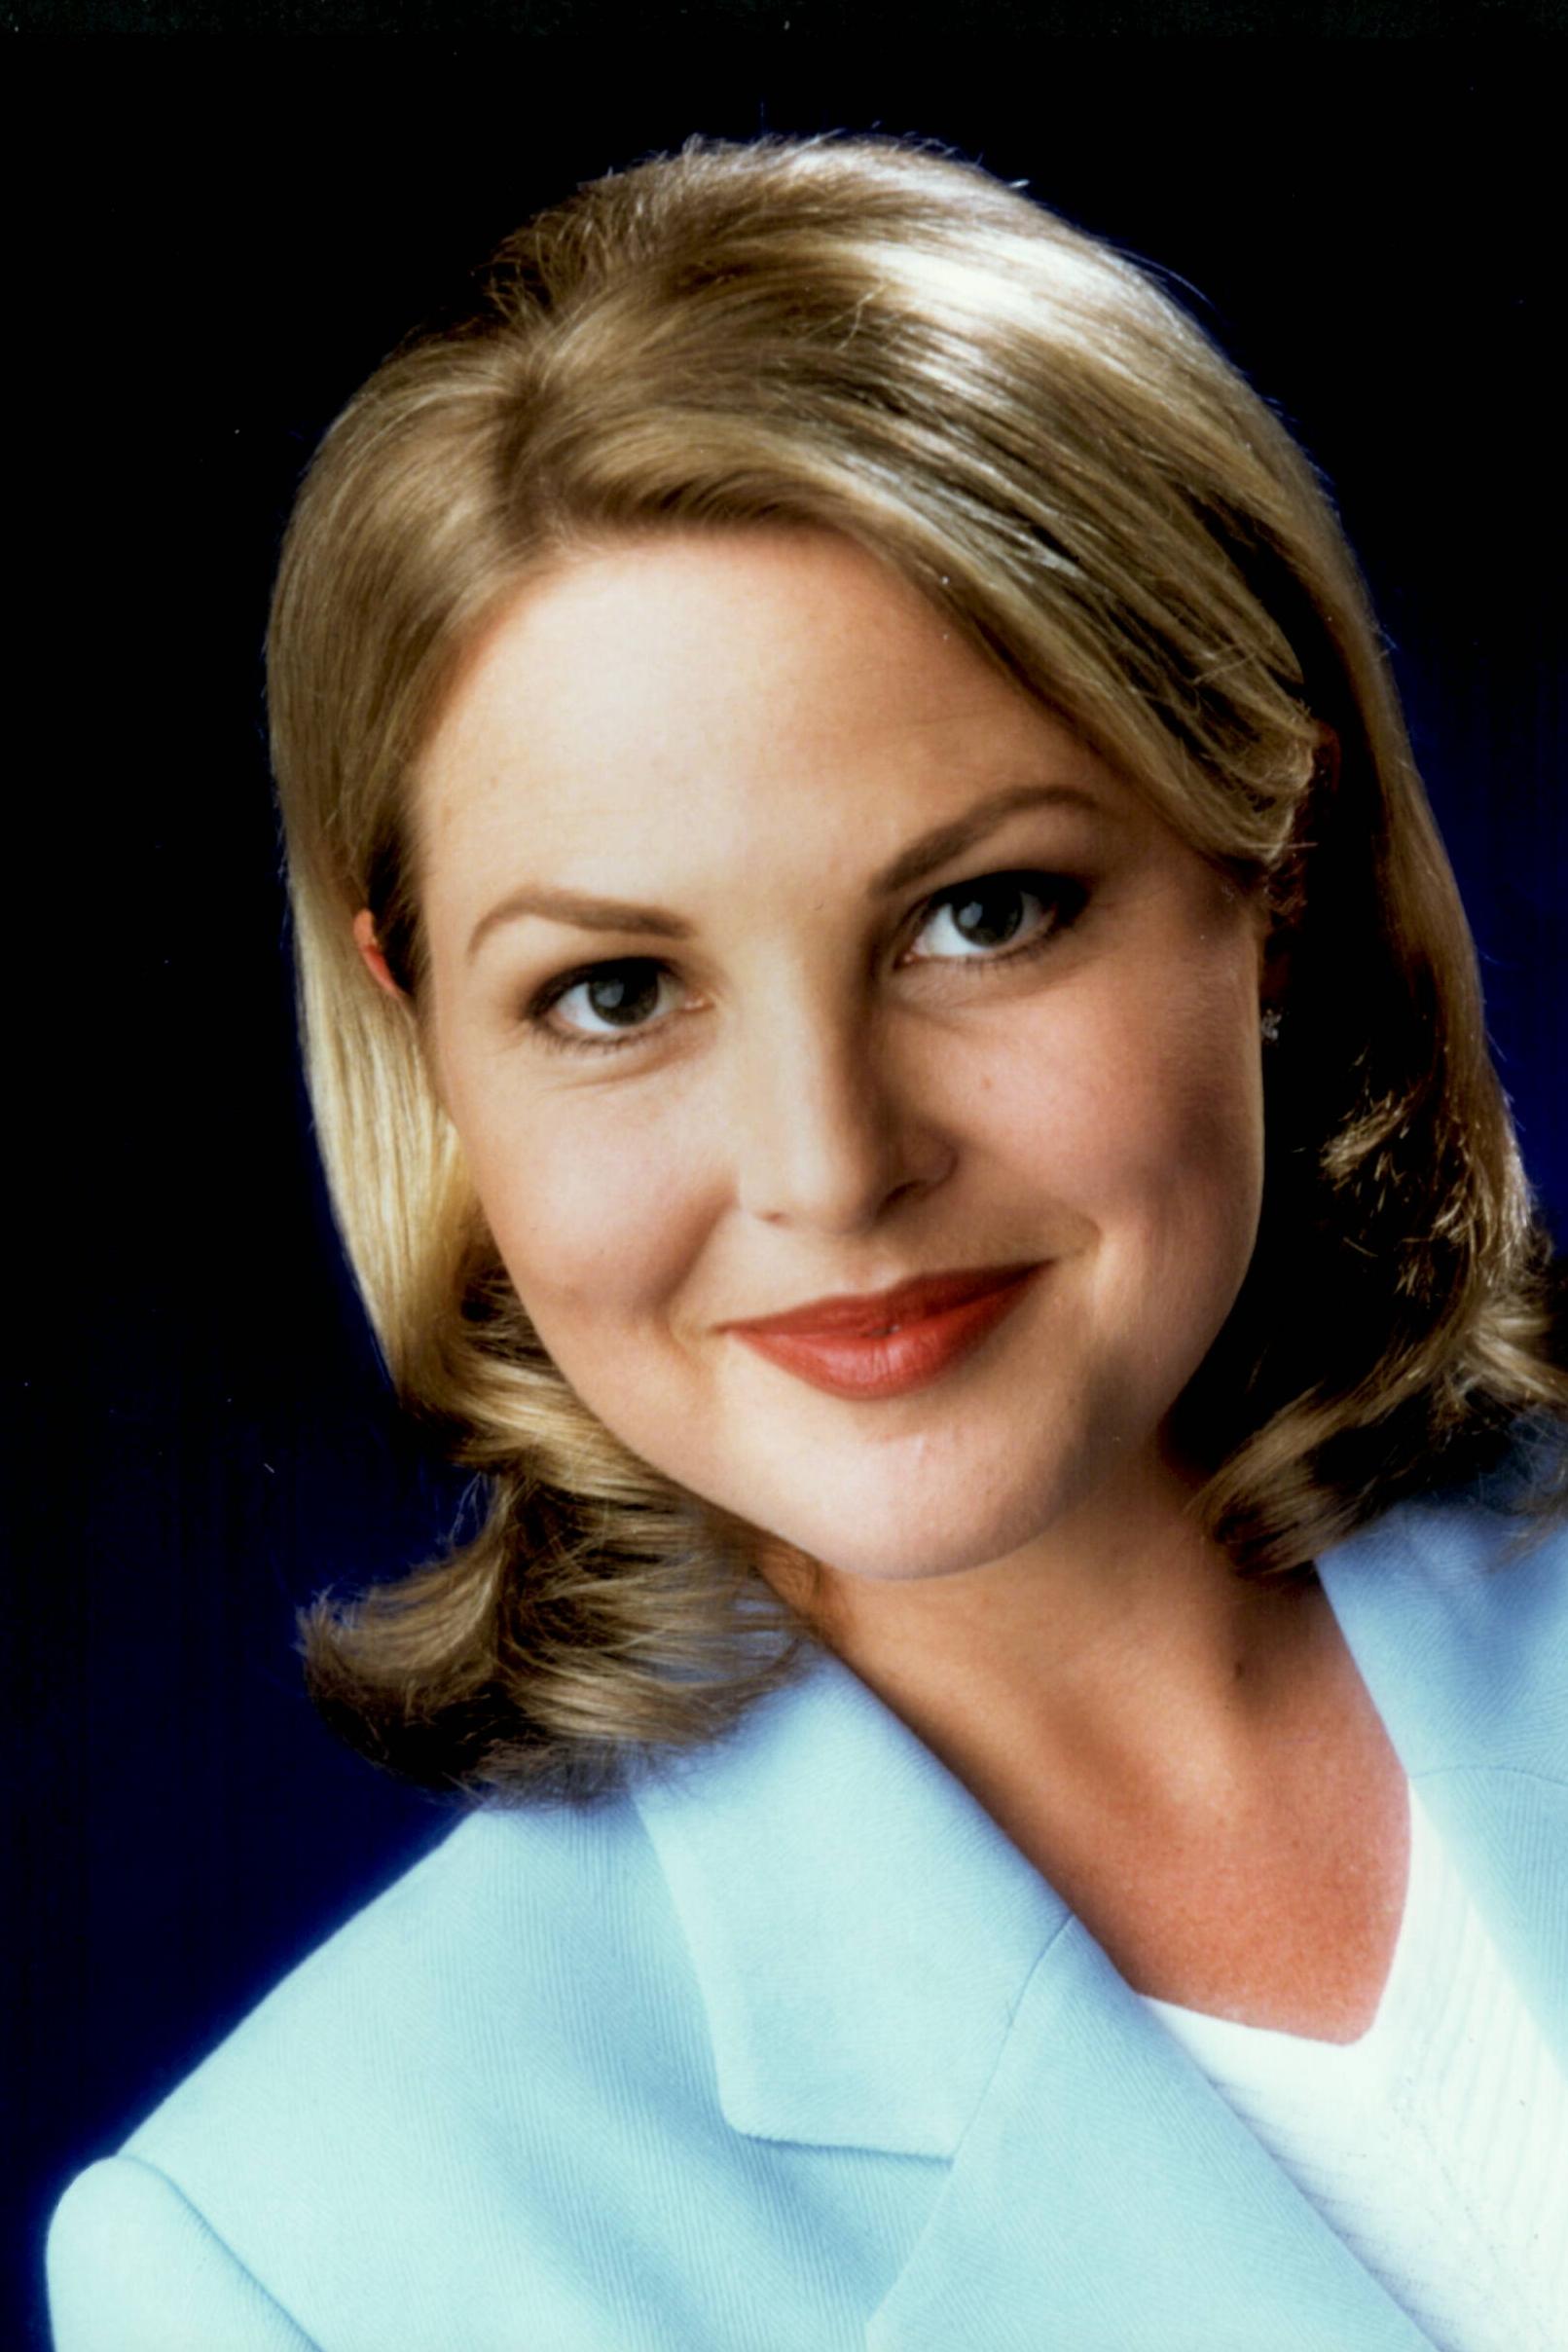 1990's | Makeup on Georgie Gardner (TV Presenter) for a publicity still